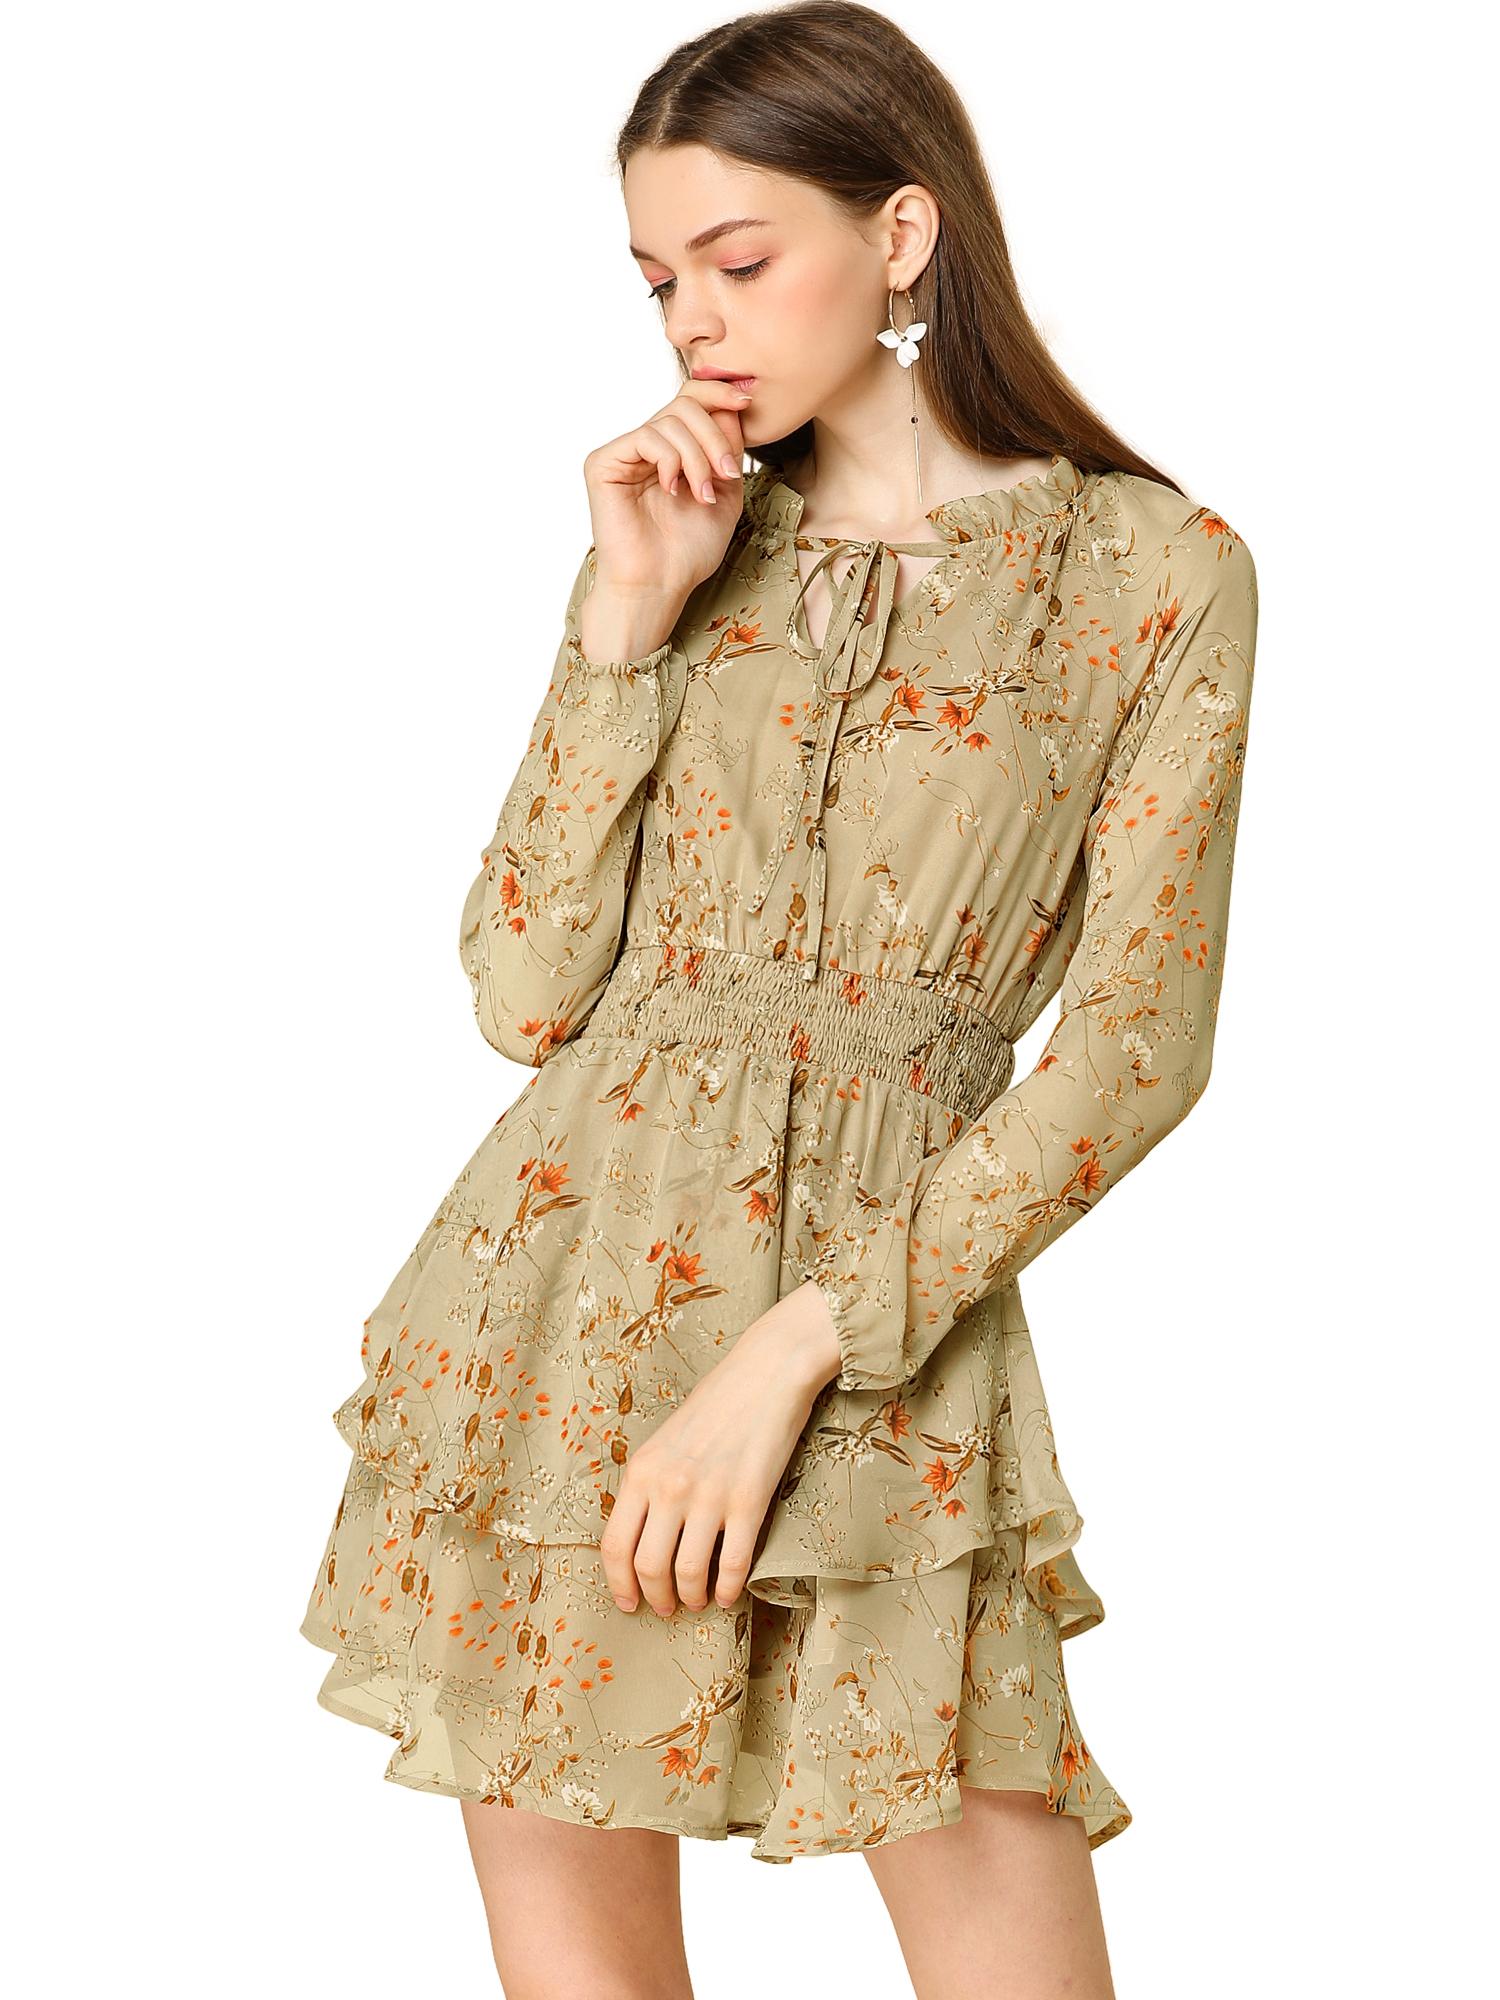 Allegra K Women's Floral Smocked Waist Chiffon Dress Khaki XL